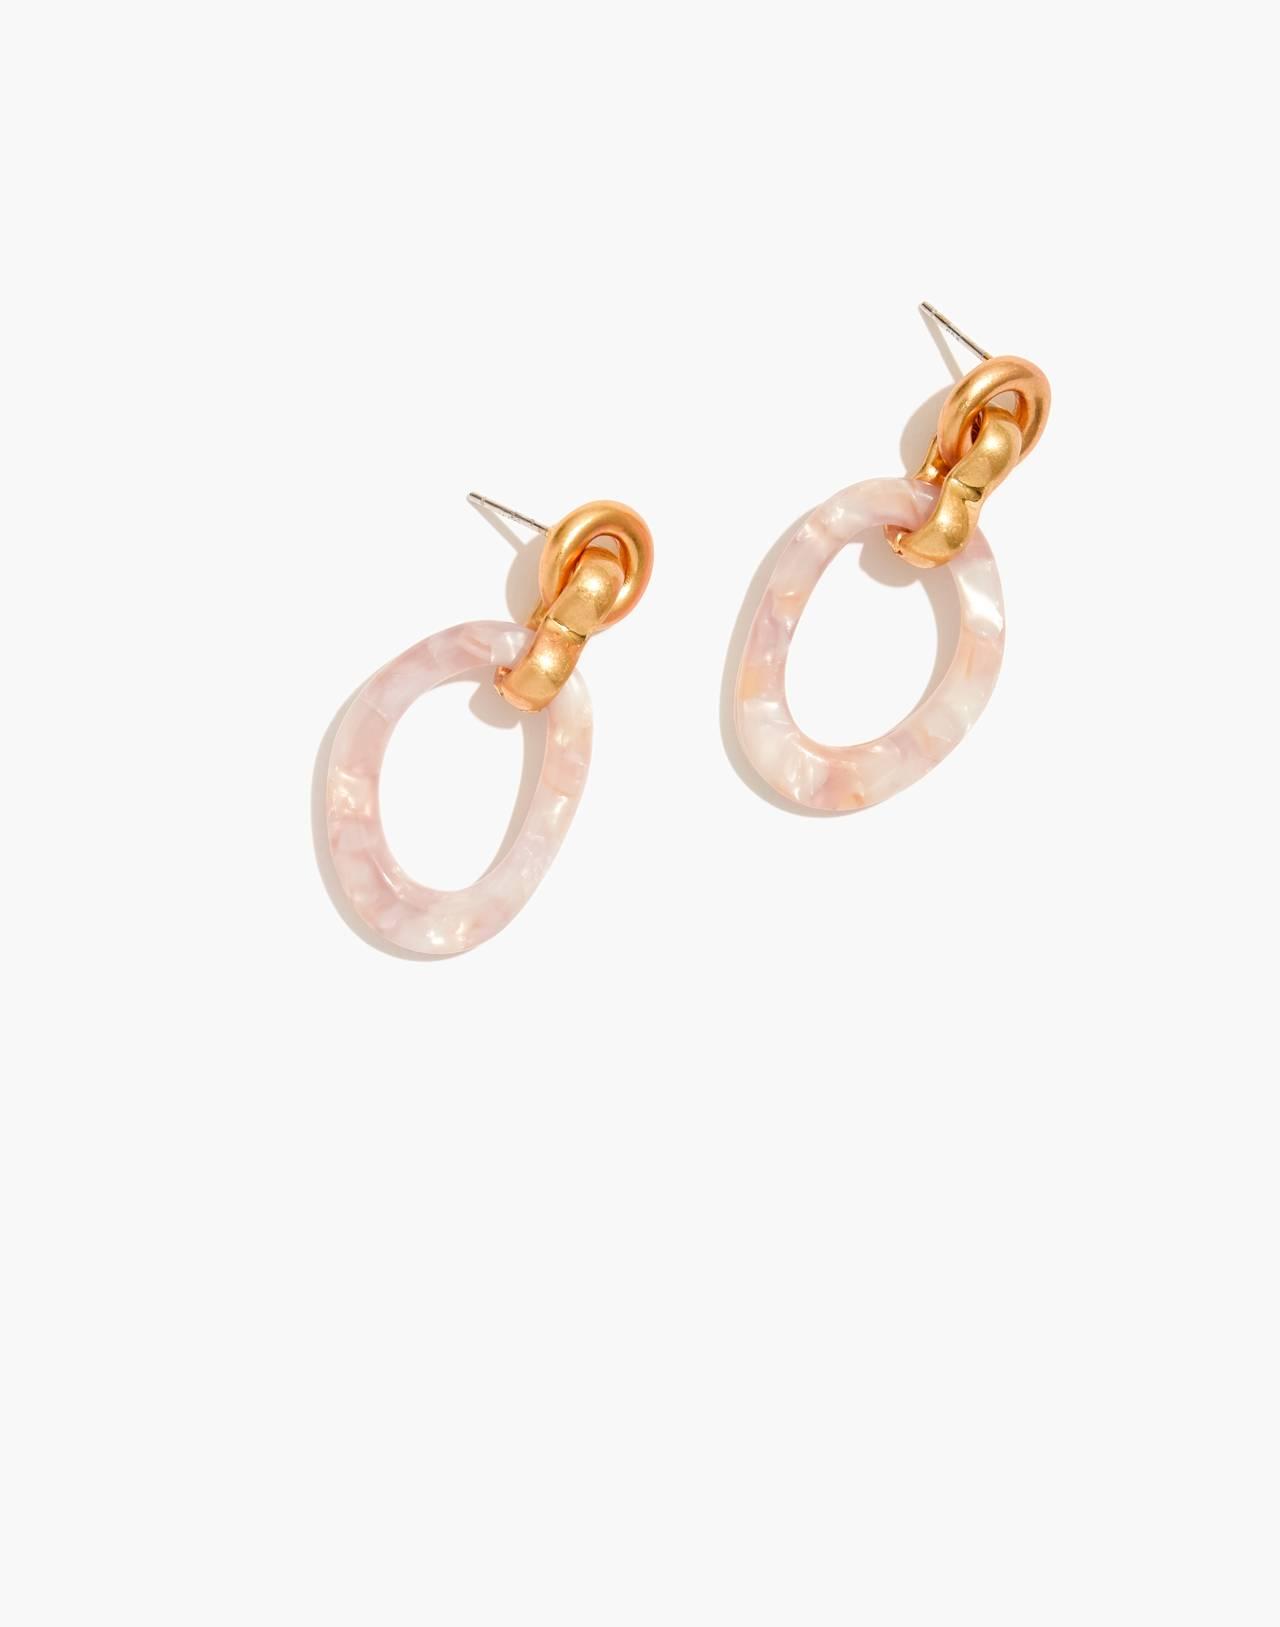 Acrylic Link Earrings in blush tort image 1